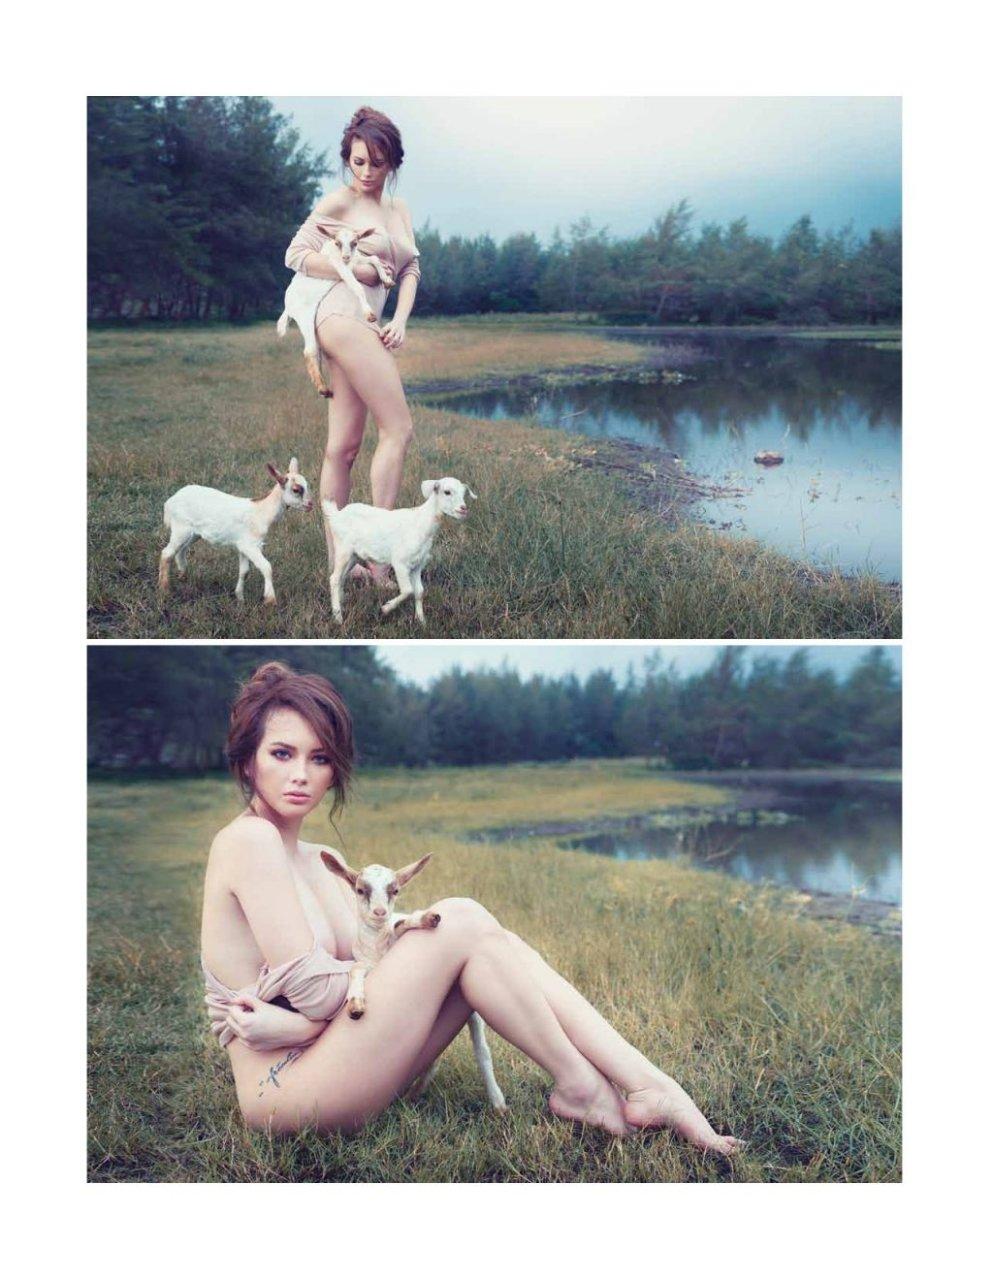 Ellen Adarna Nude Sexy - 7 Photos Video new images